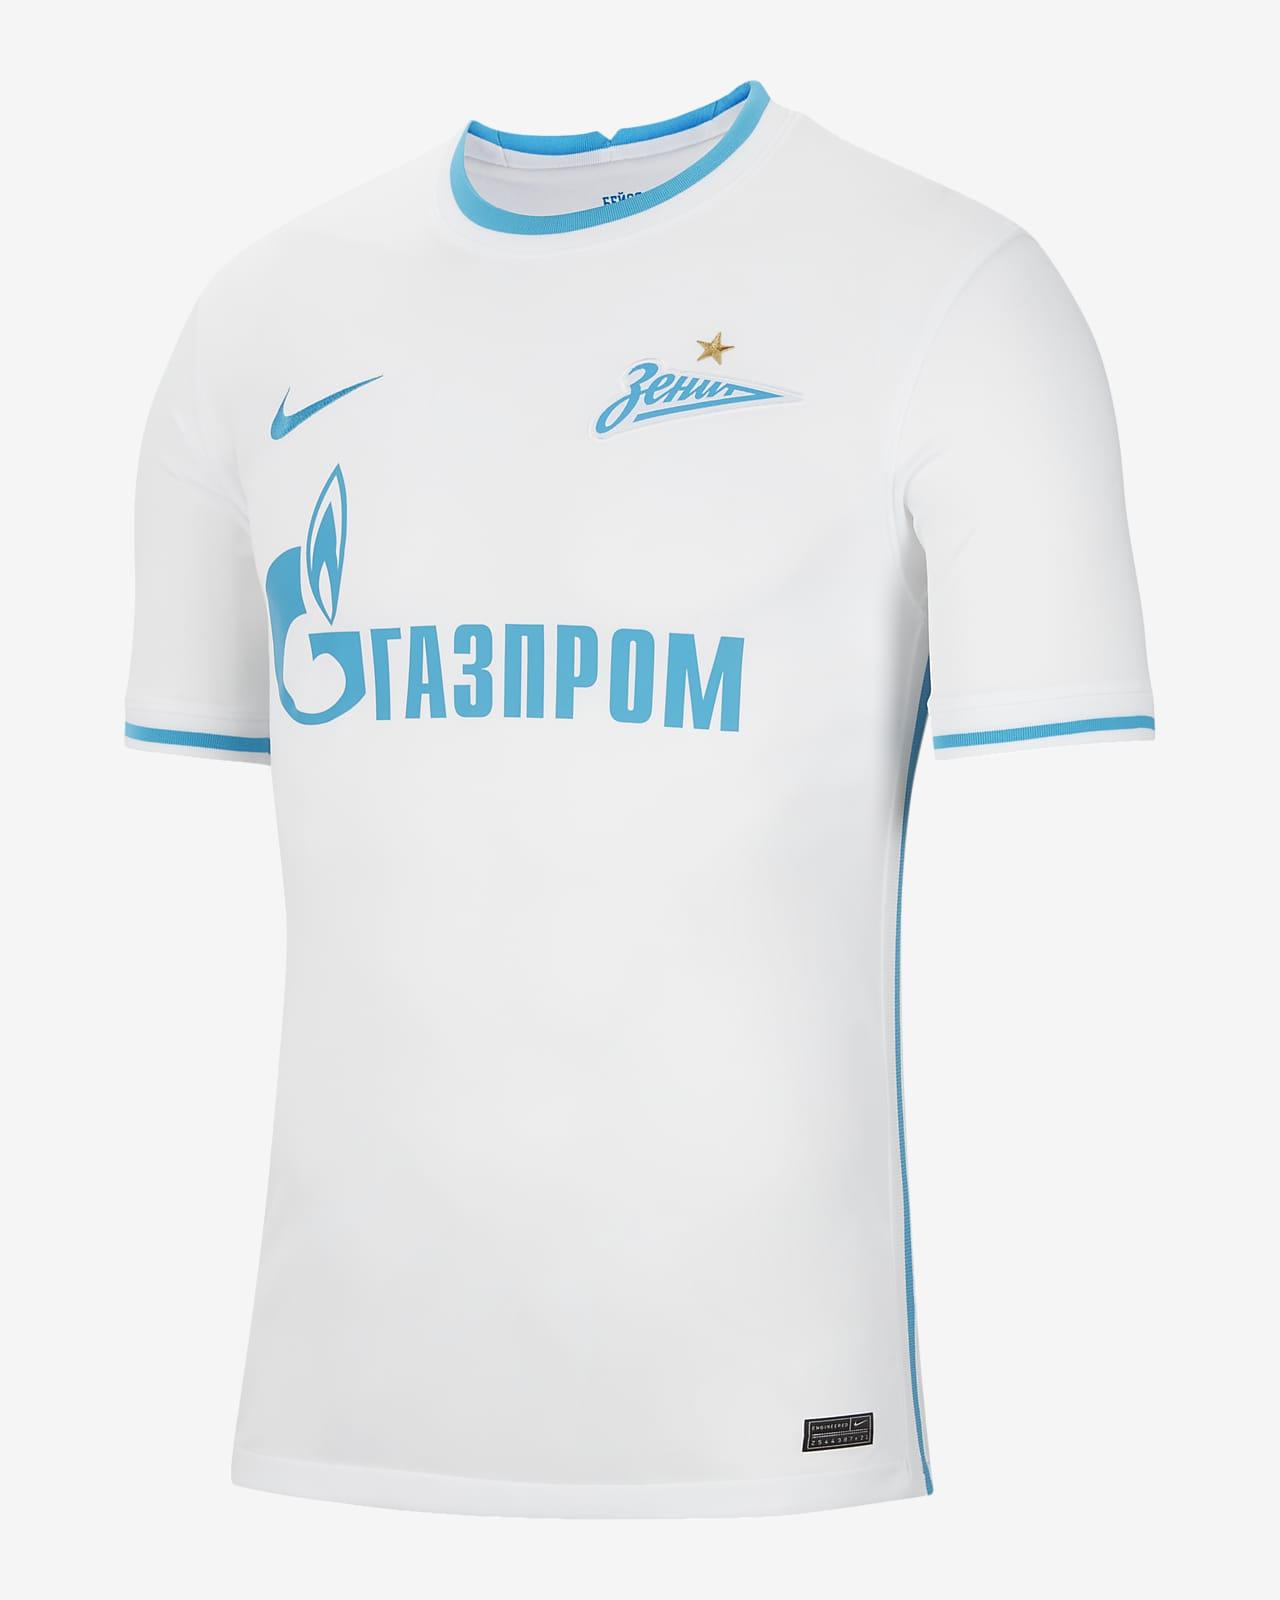 Zenit Saint Petersburg 2021/22 Stadyum Deplasman Nike Dri-FIT Erkek Futbol Forması